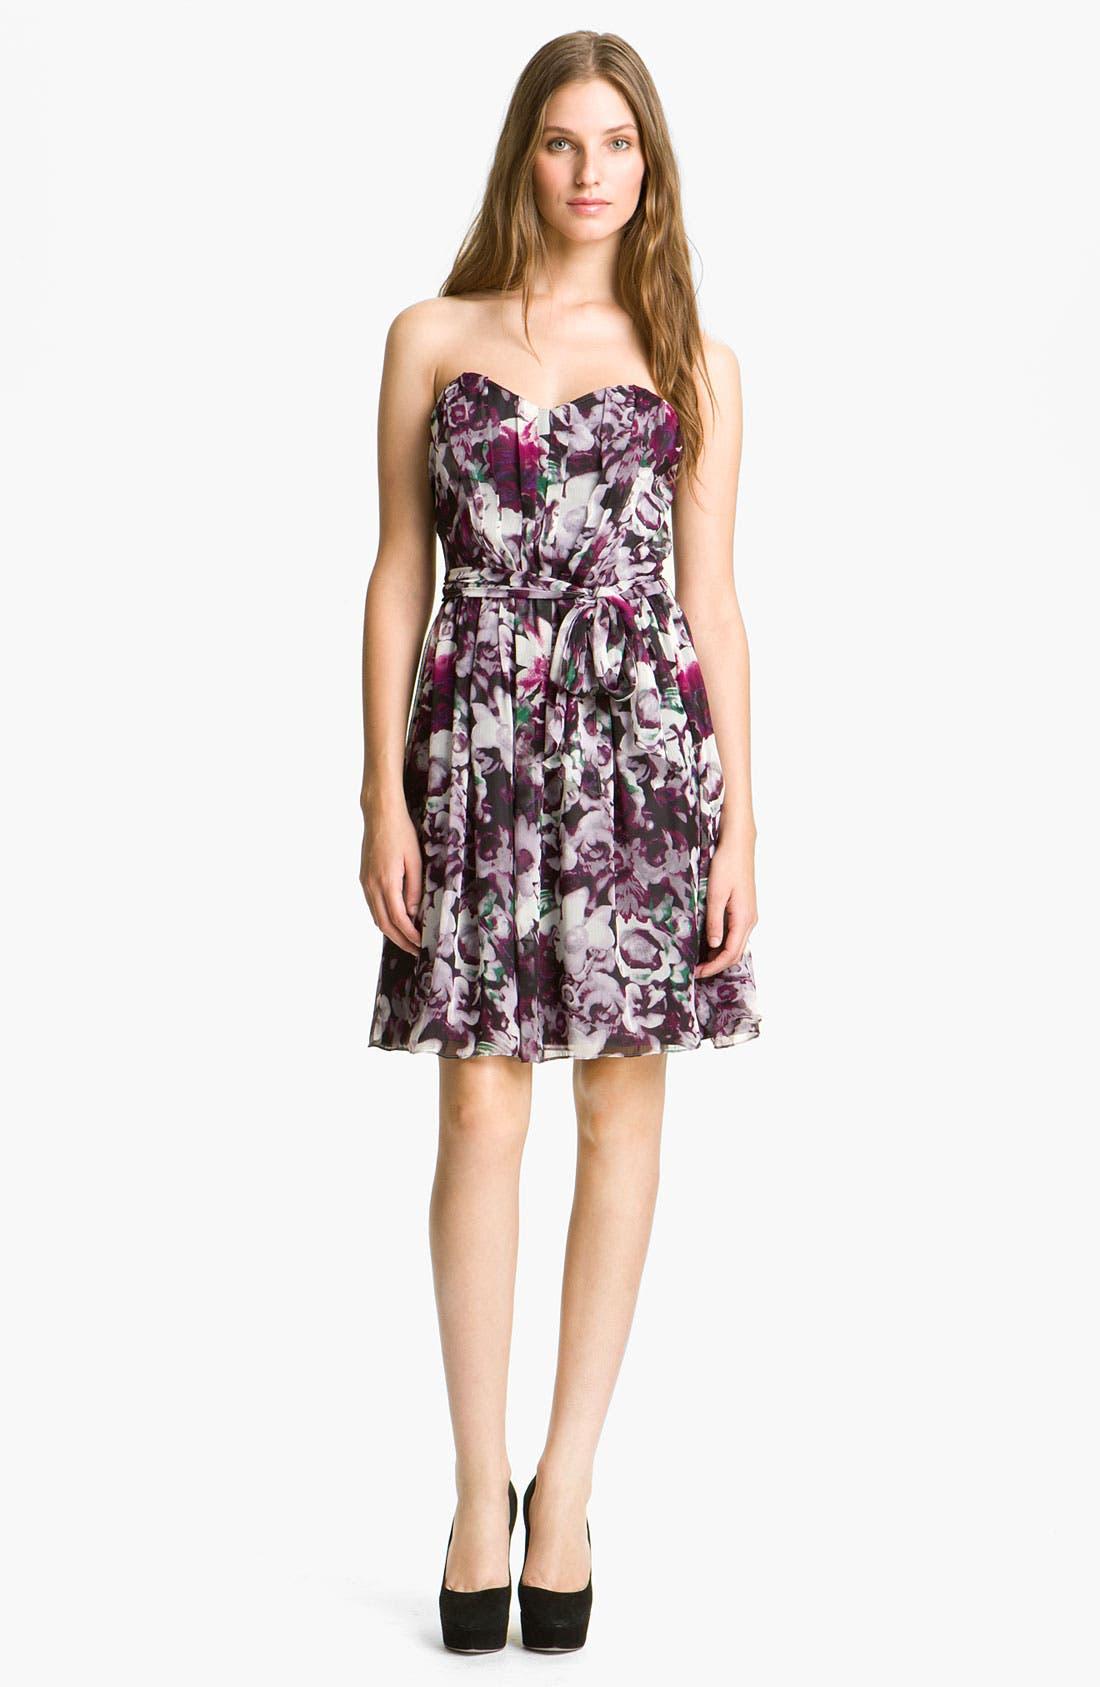 Alternate Image 1 Selected - Mcginn 'Iris' Floral Print Dress